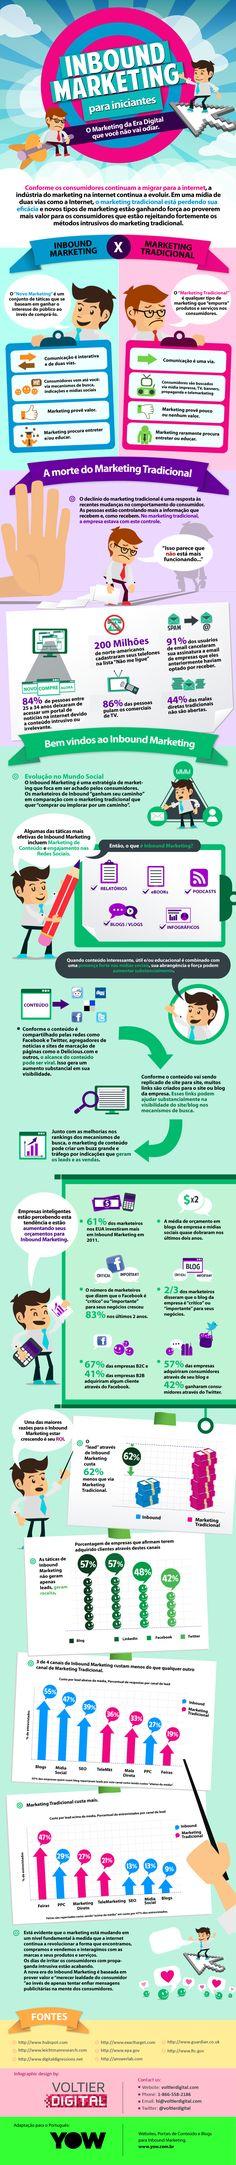 Infografico sobre #inboundmarketing. #marketingdigital. #ficadica